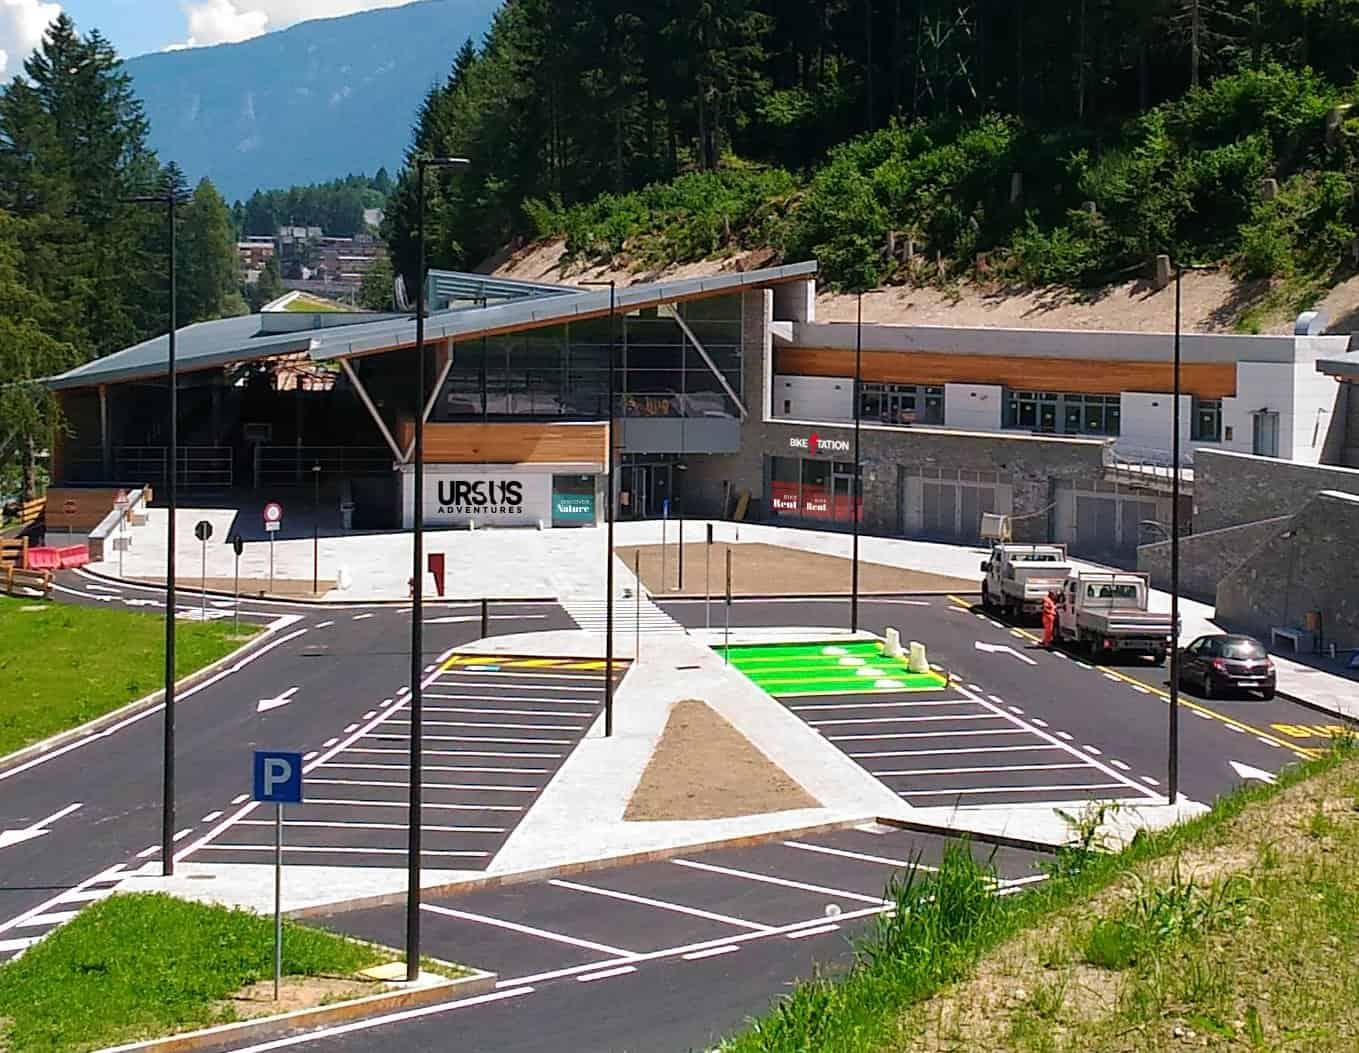 noleggio mountain bike Val di Sole Mezzana bike station